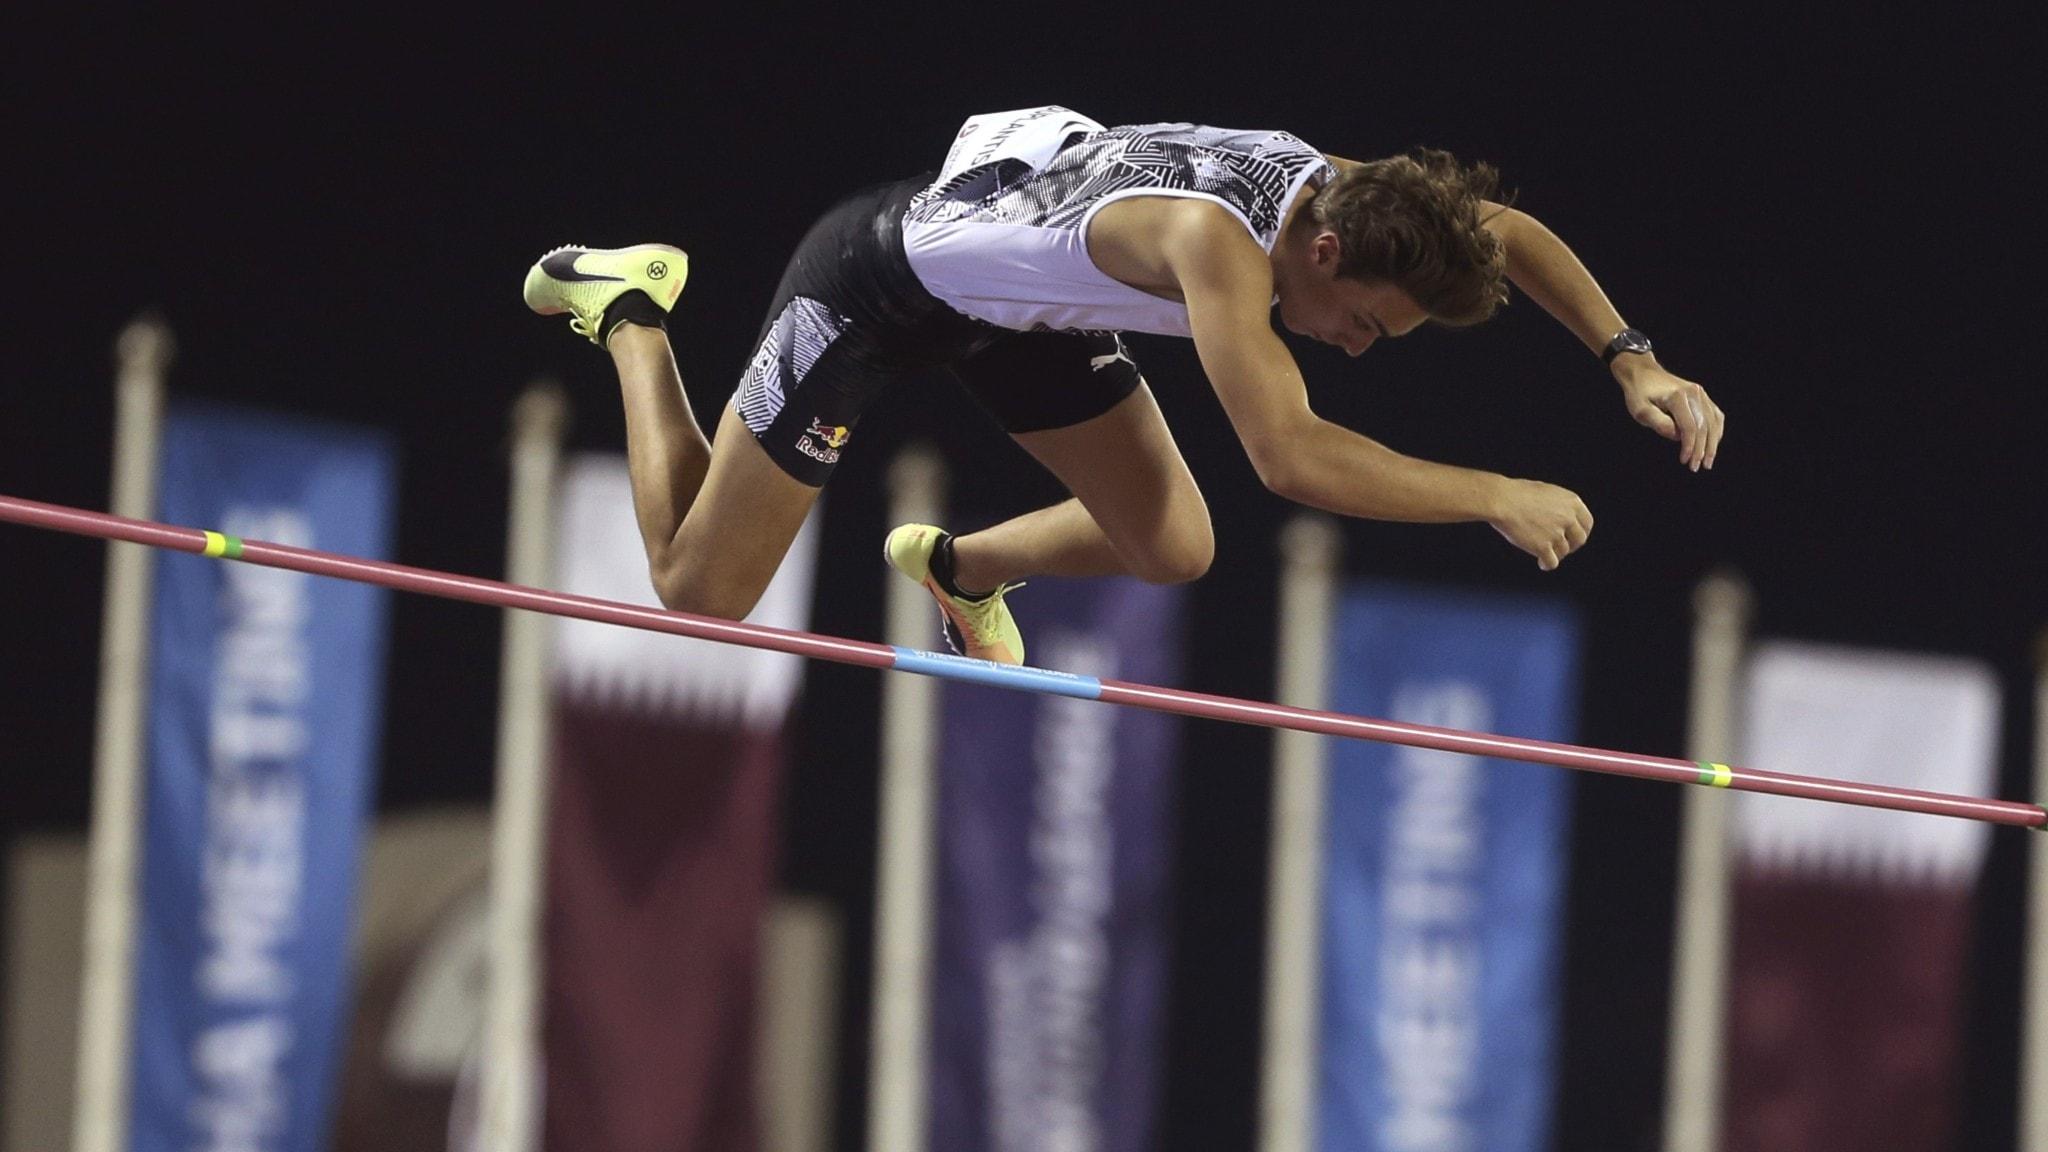 A man flying through the air over a horizontal bar.